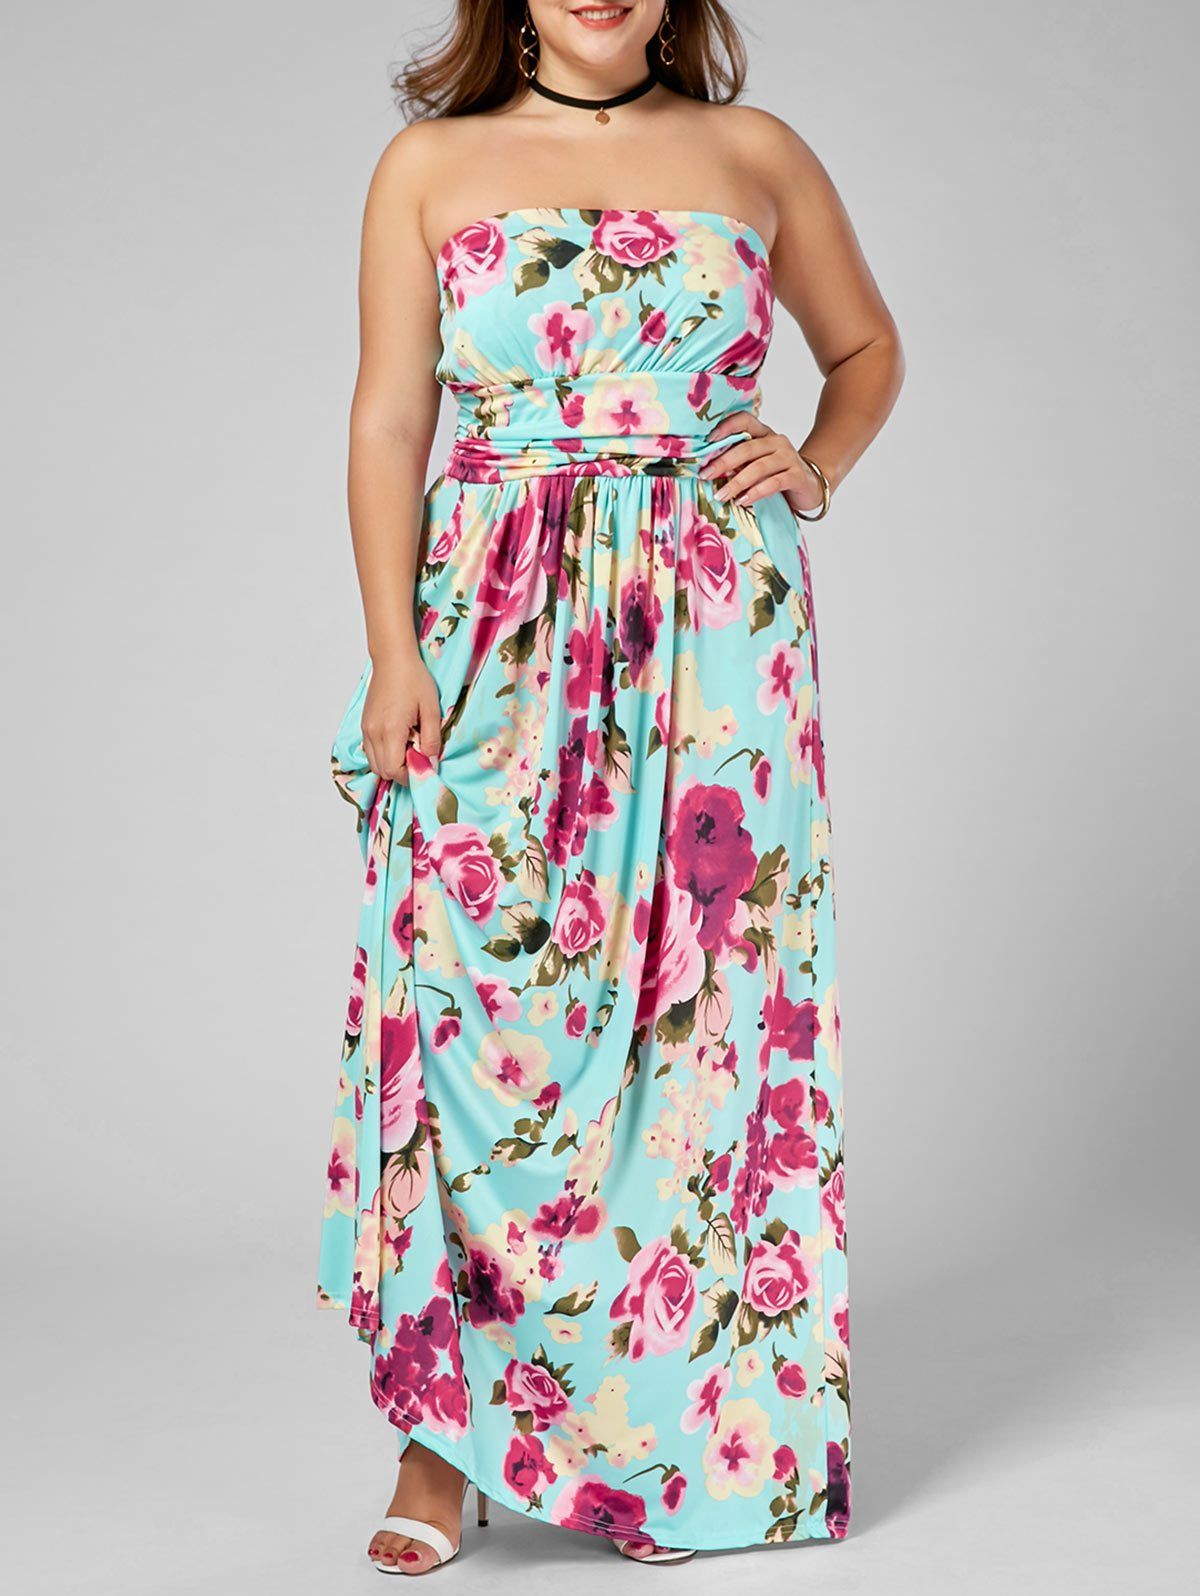 aaeb6637d4 Strapless Floral Boho A-Line Maxi Dress  (2XL-5XL) in 2019